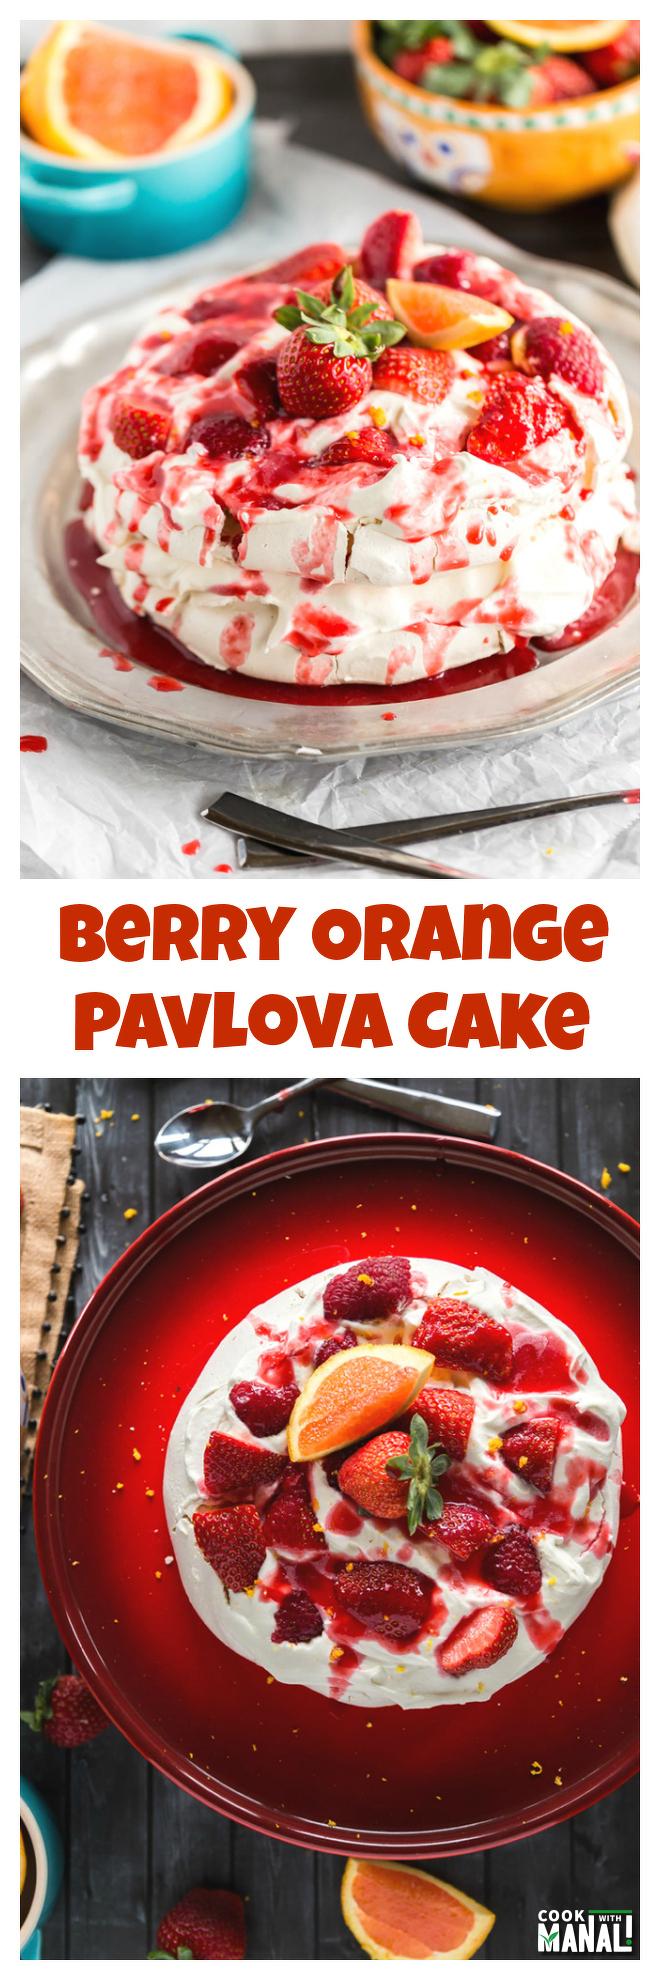 Berry Orange Pavlova Cake Collage